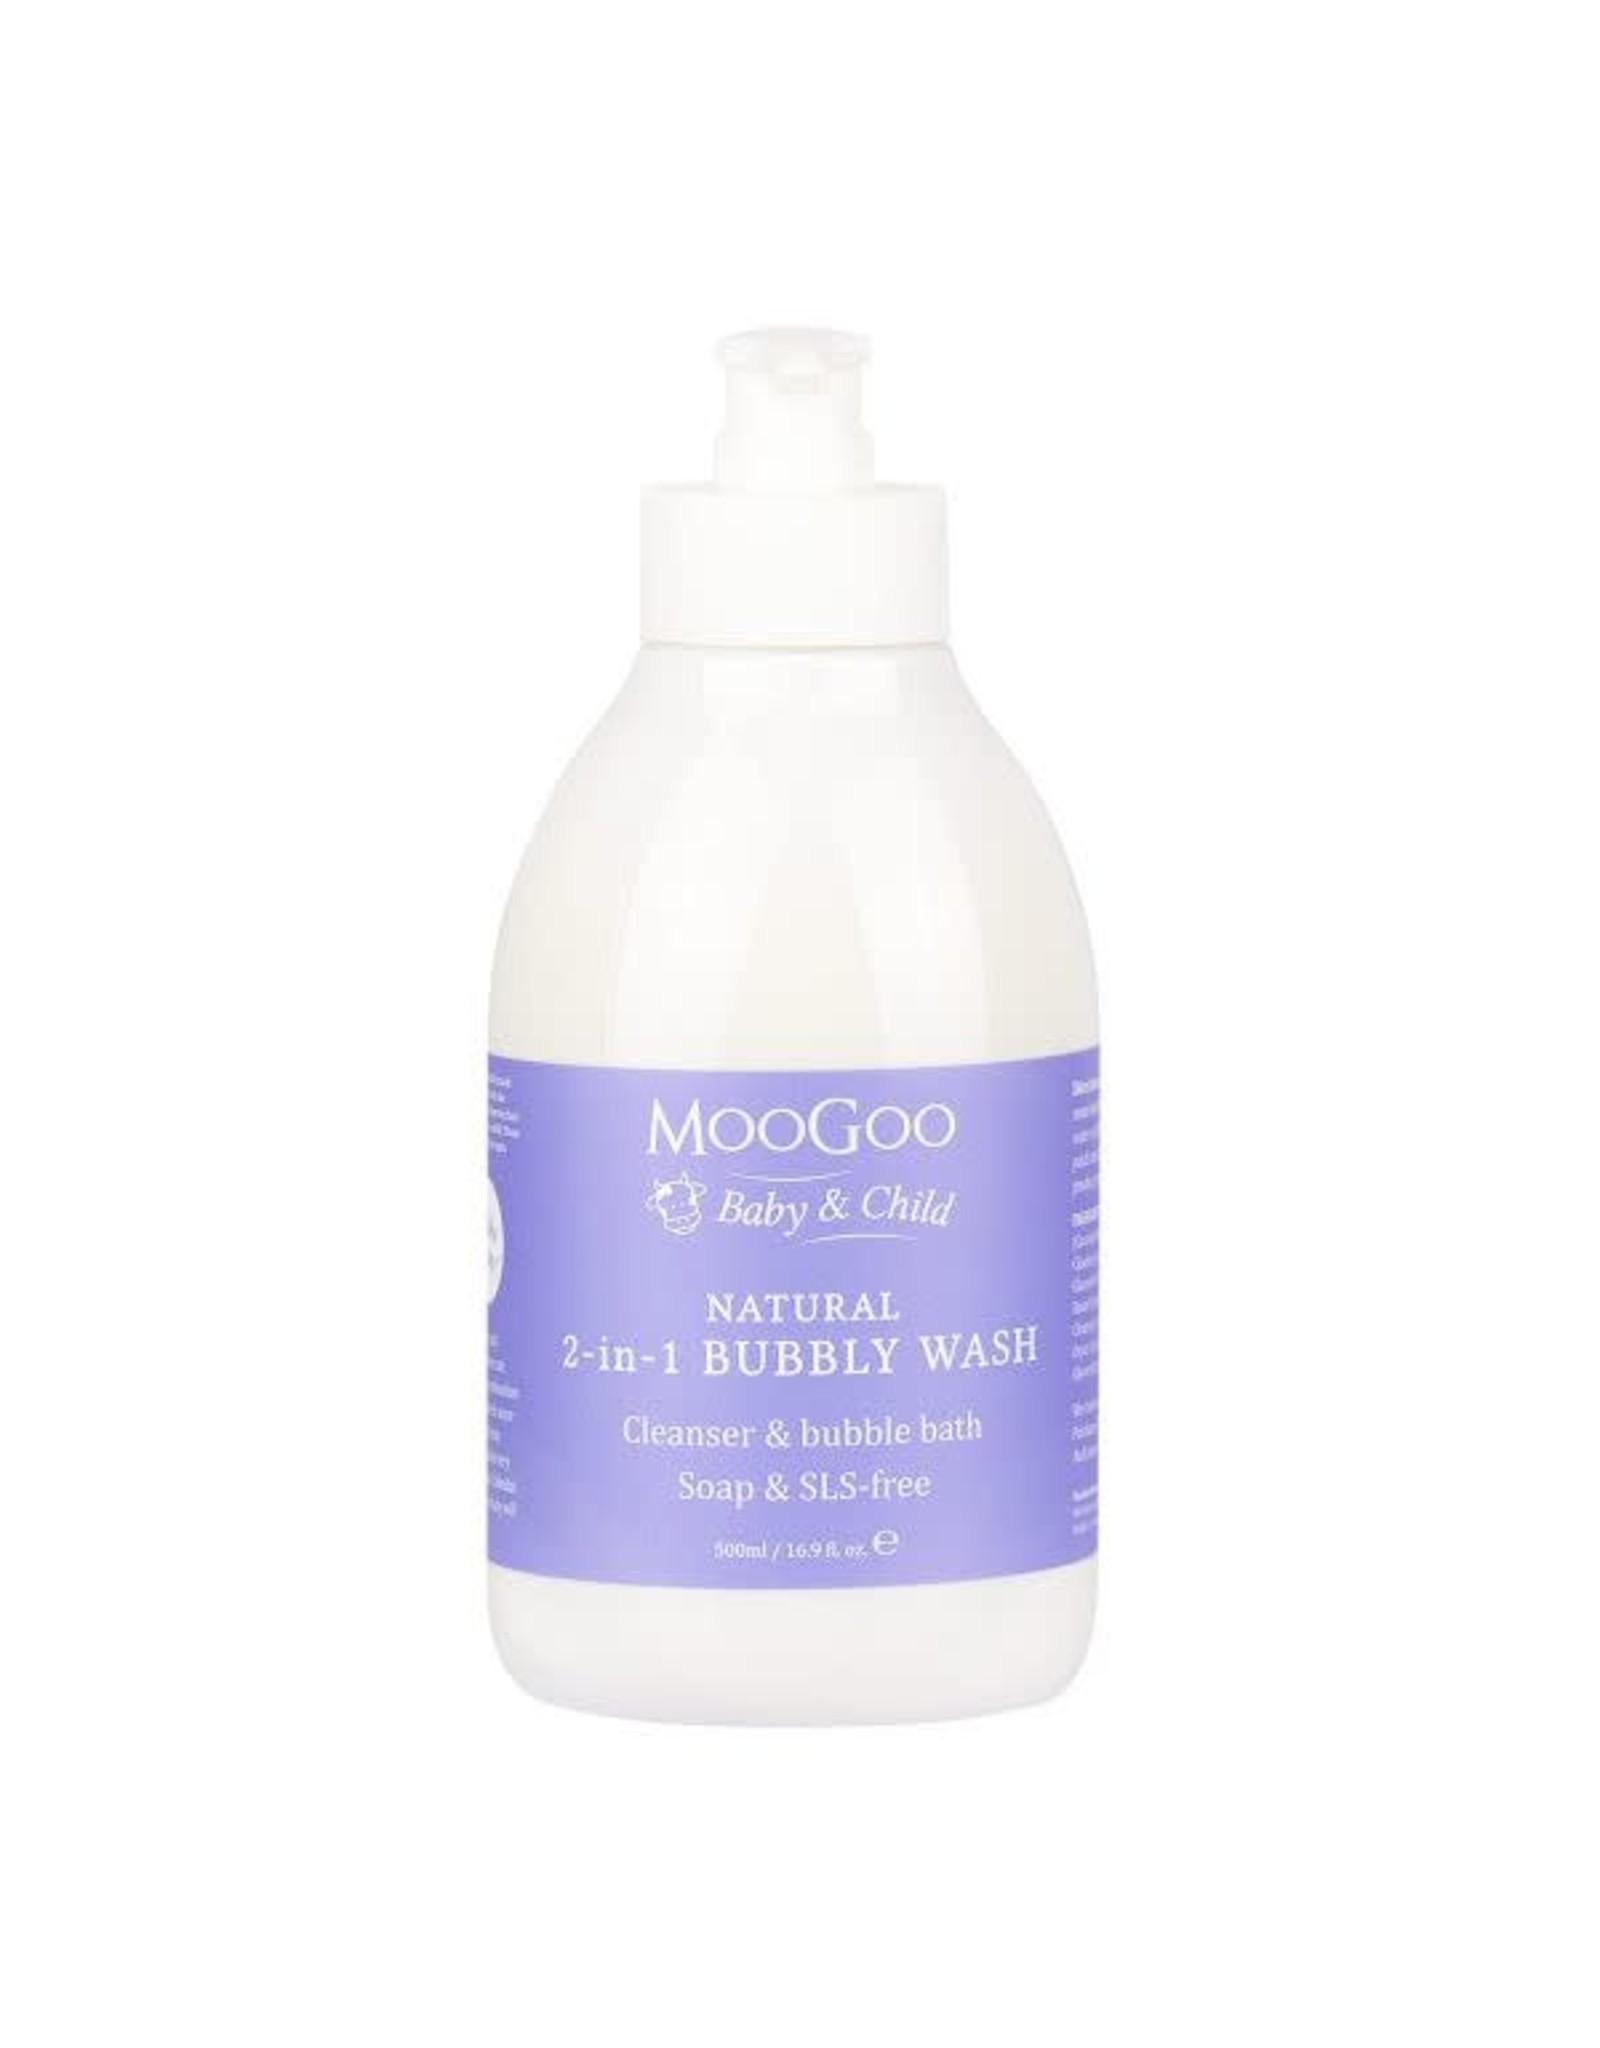 Moogoo 2-in-1 Bubbly Wash 500ml